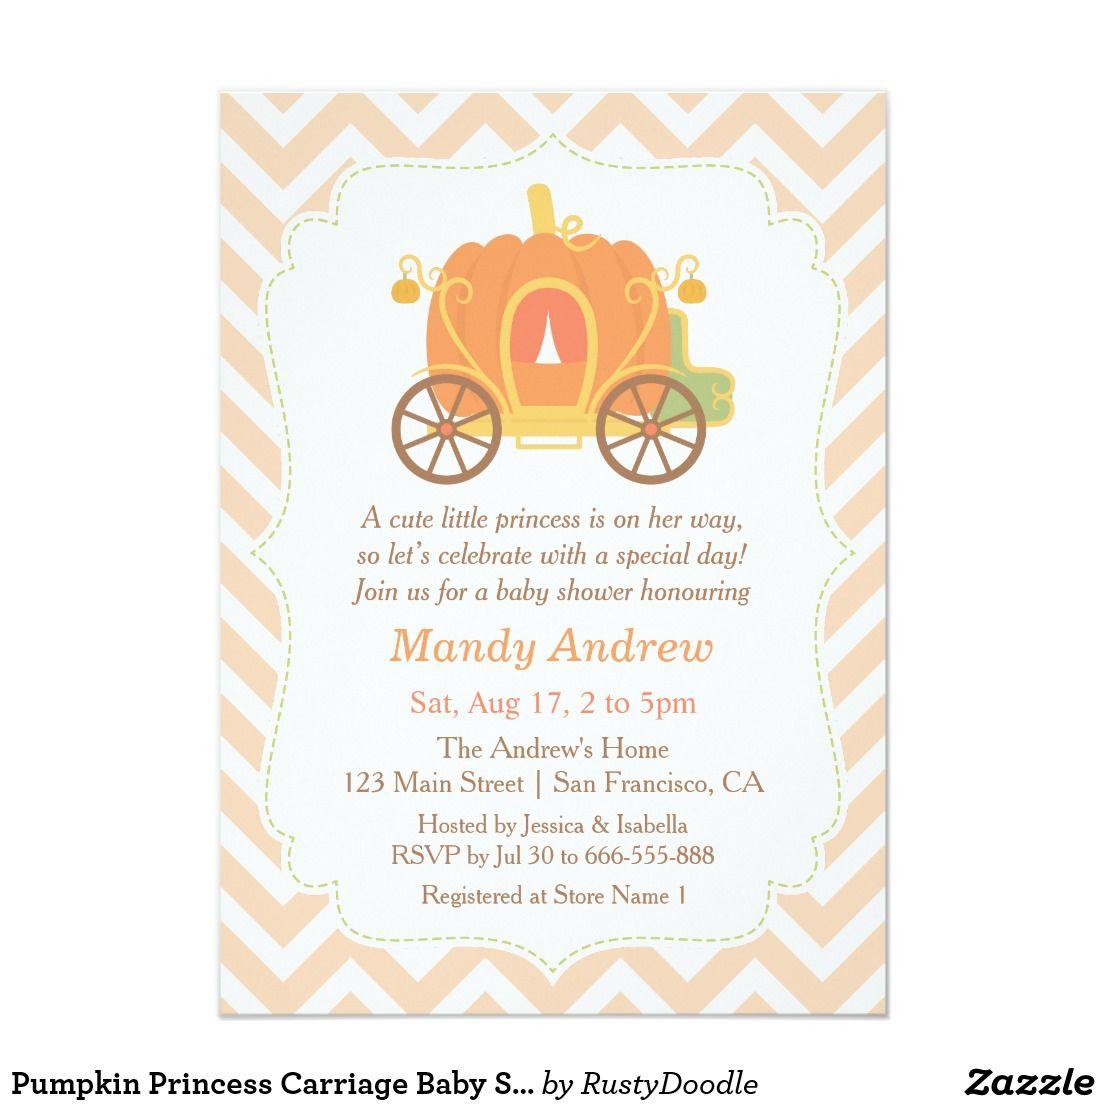 Pumpkin Princess Carriage Baby Shower